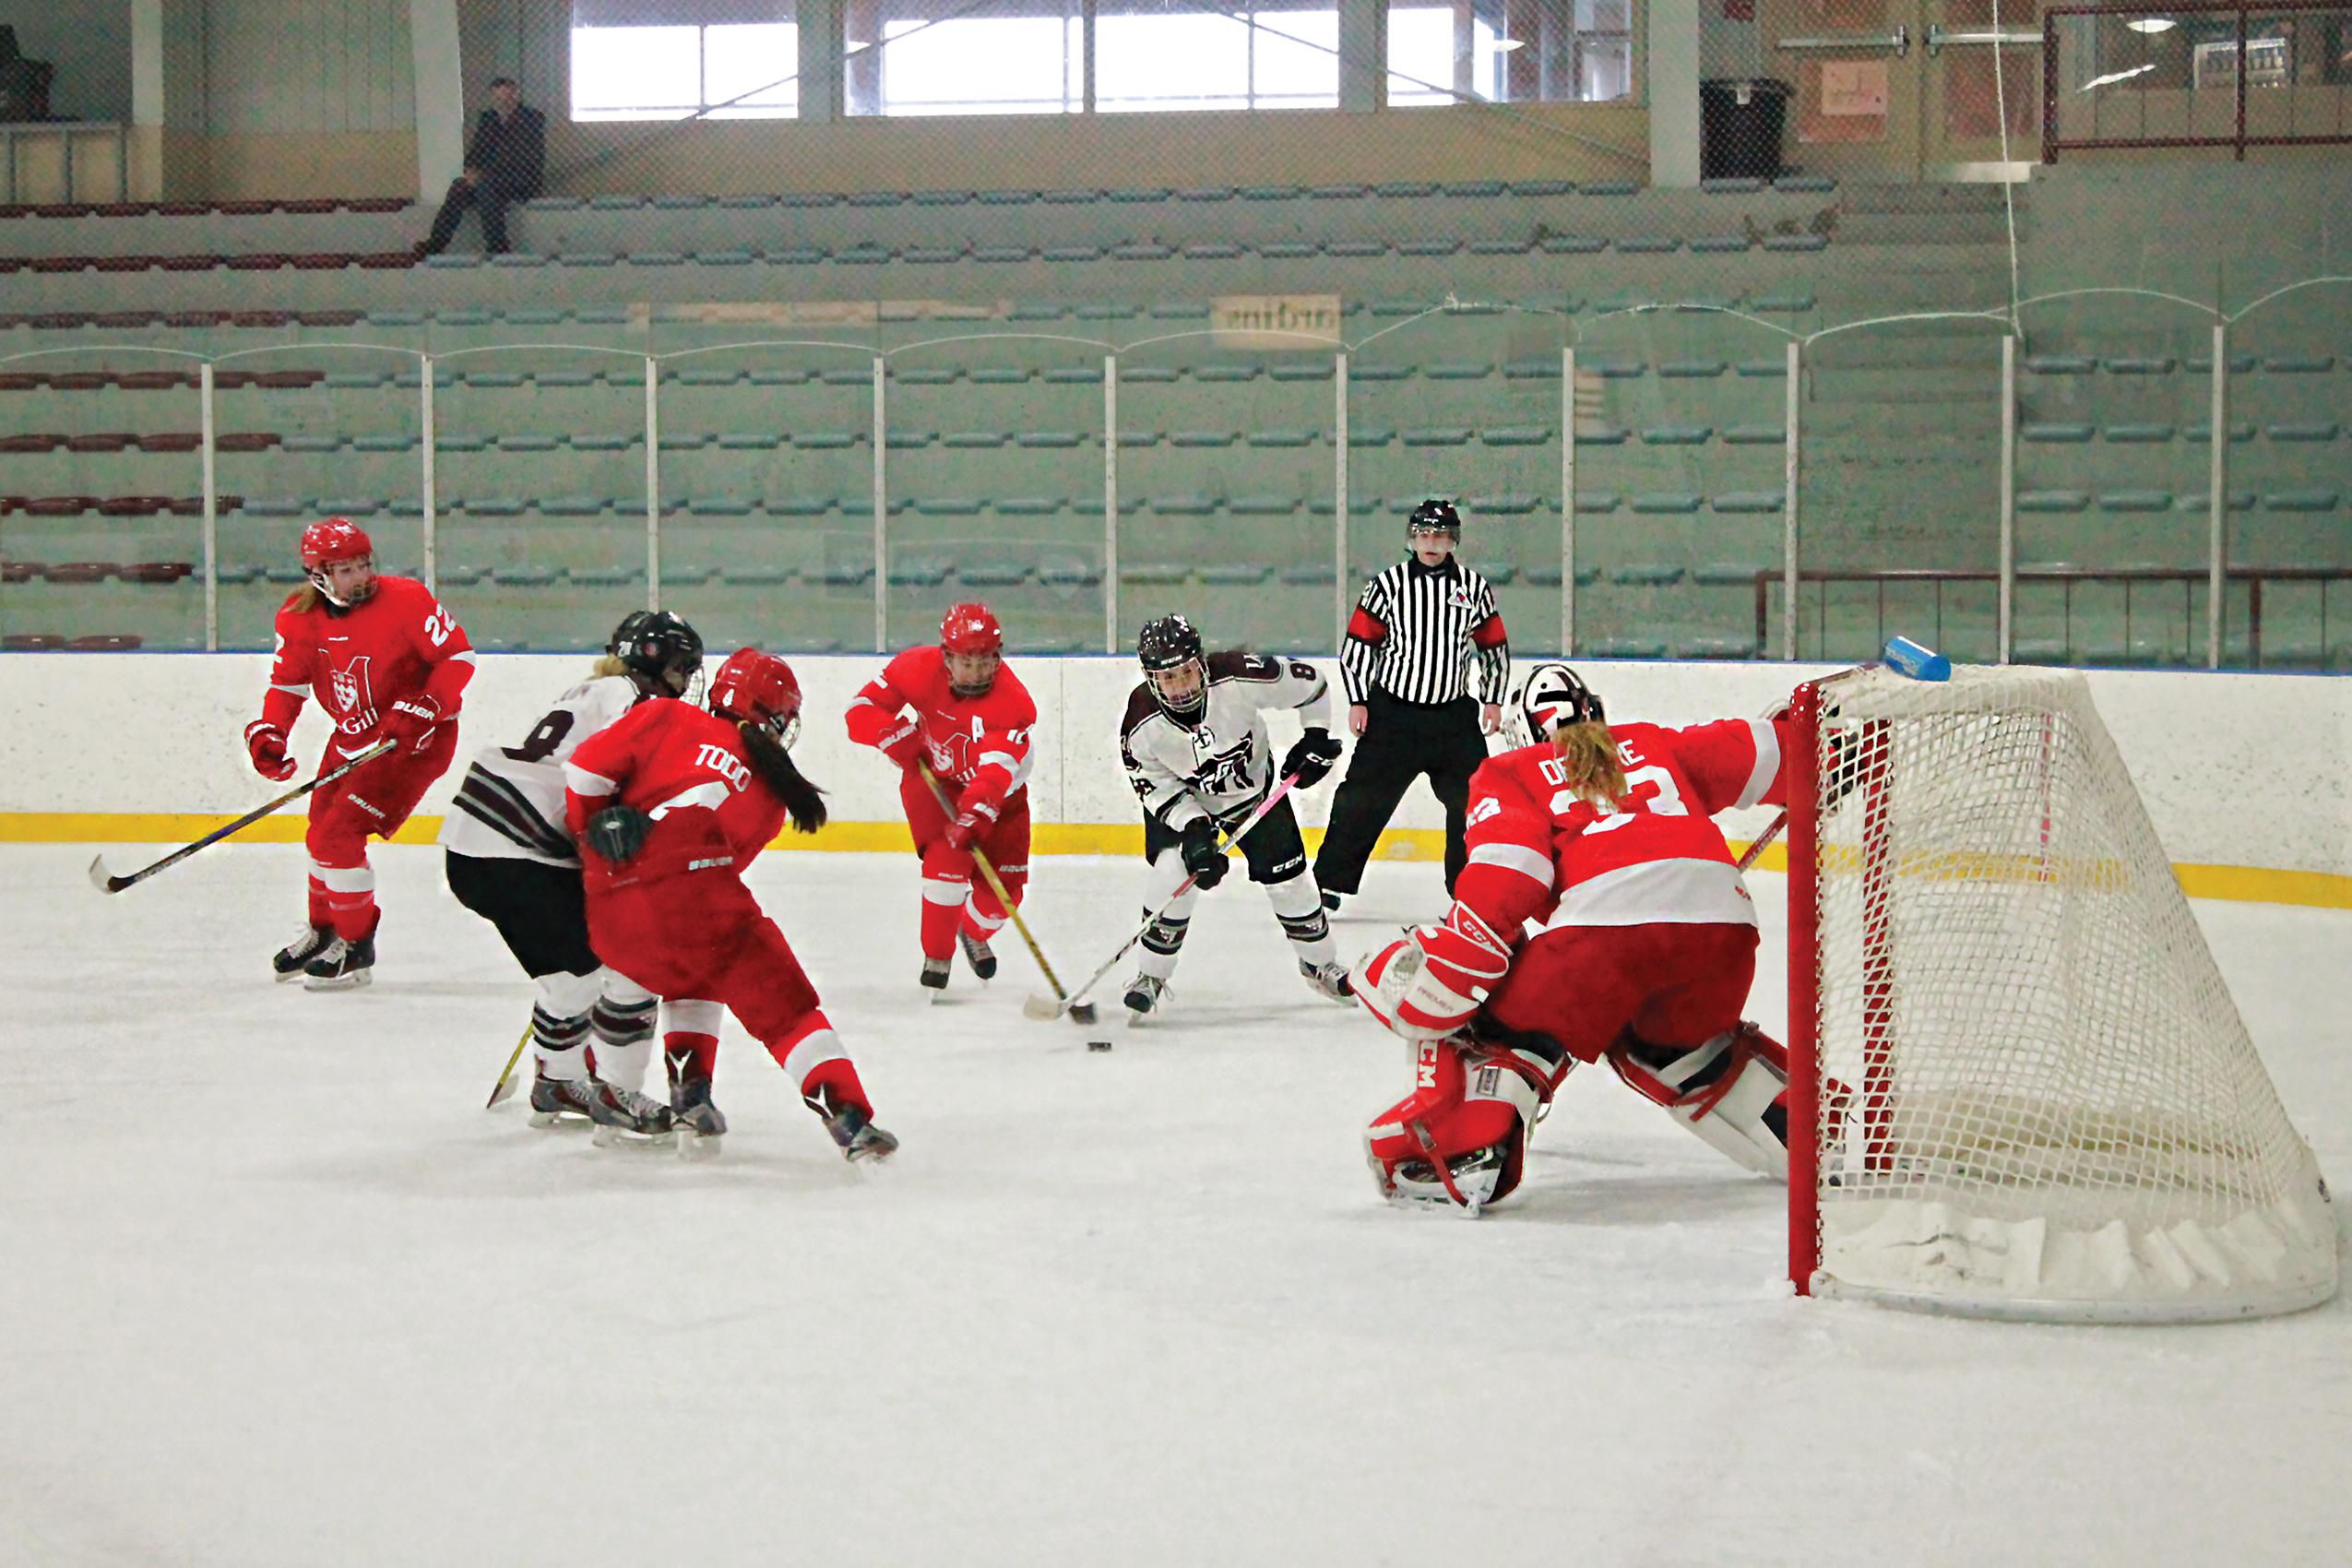 WEB_SPO_Women's_Hockey_Playoff2_cred_Kyle_Darbyson